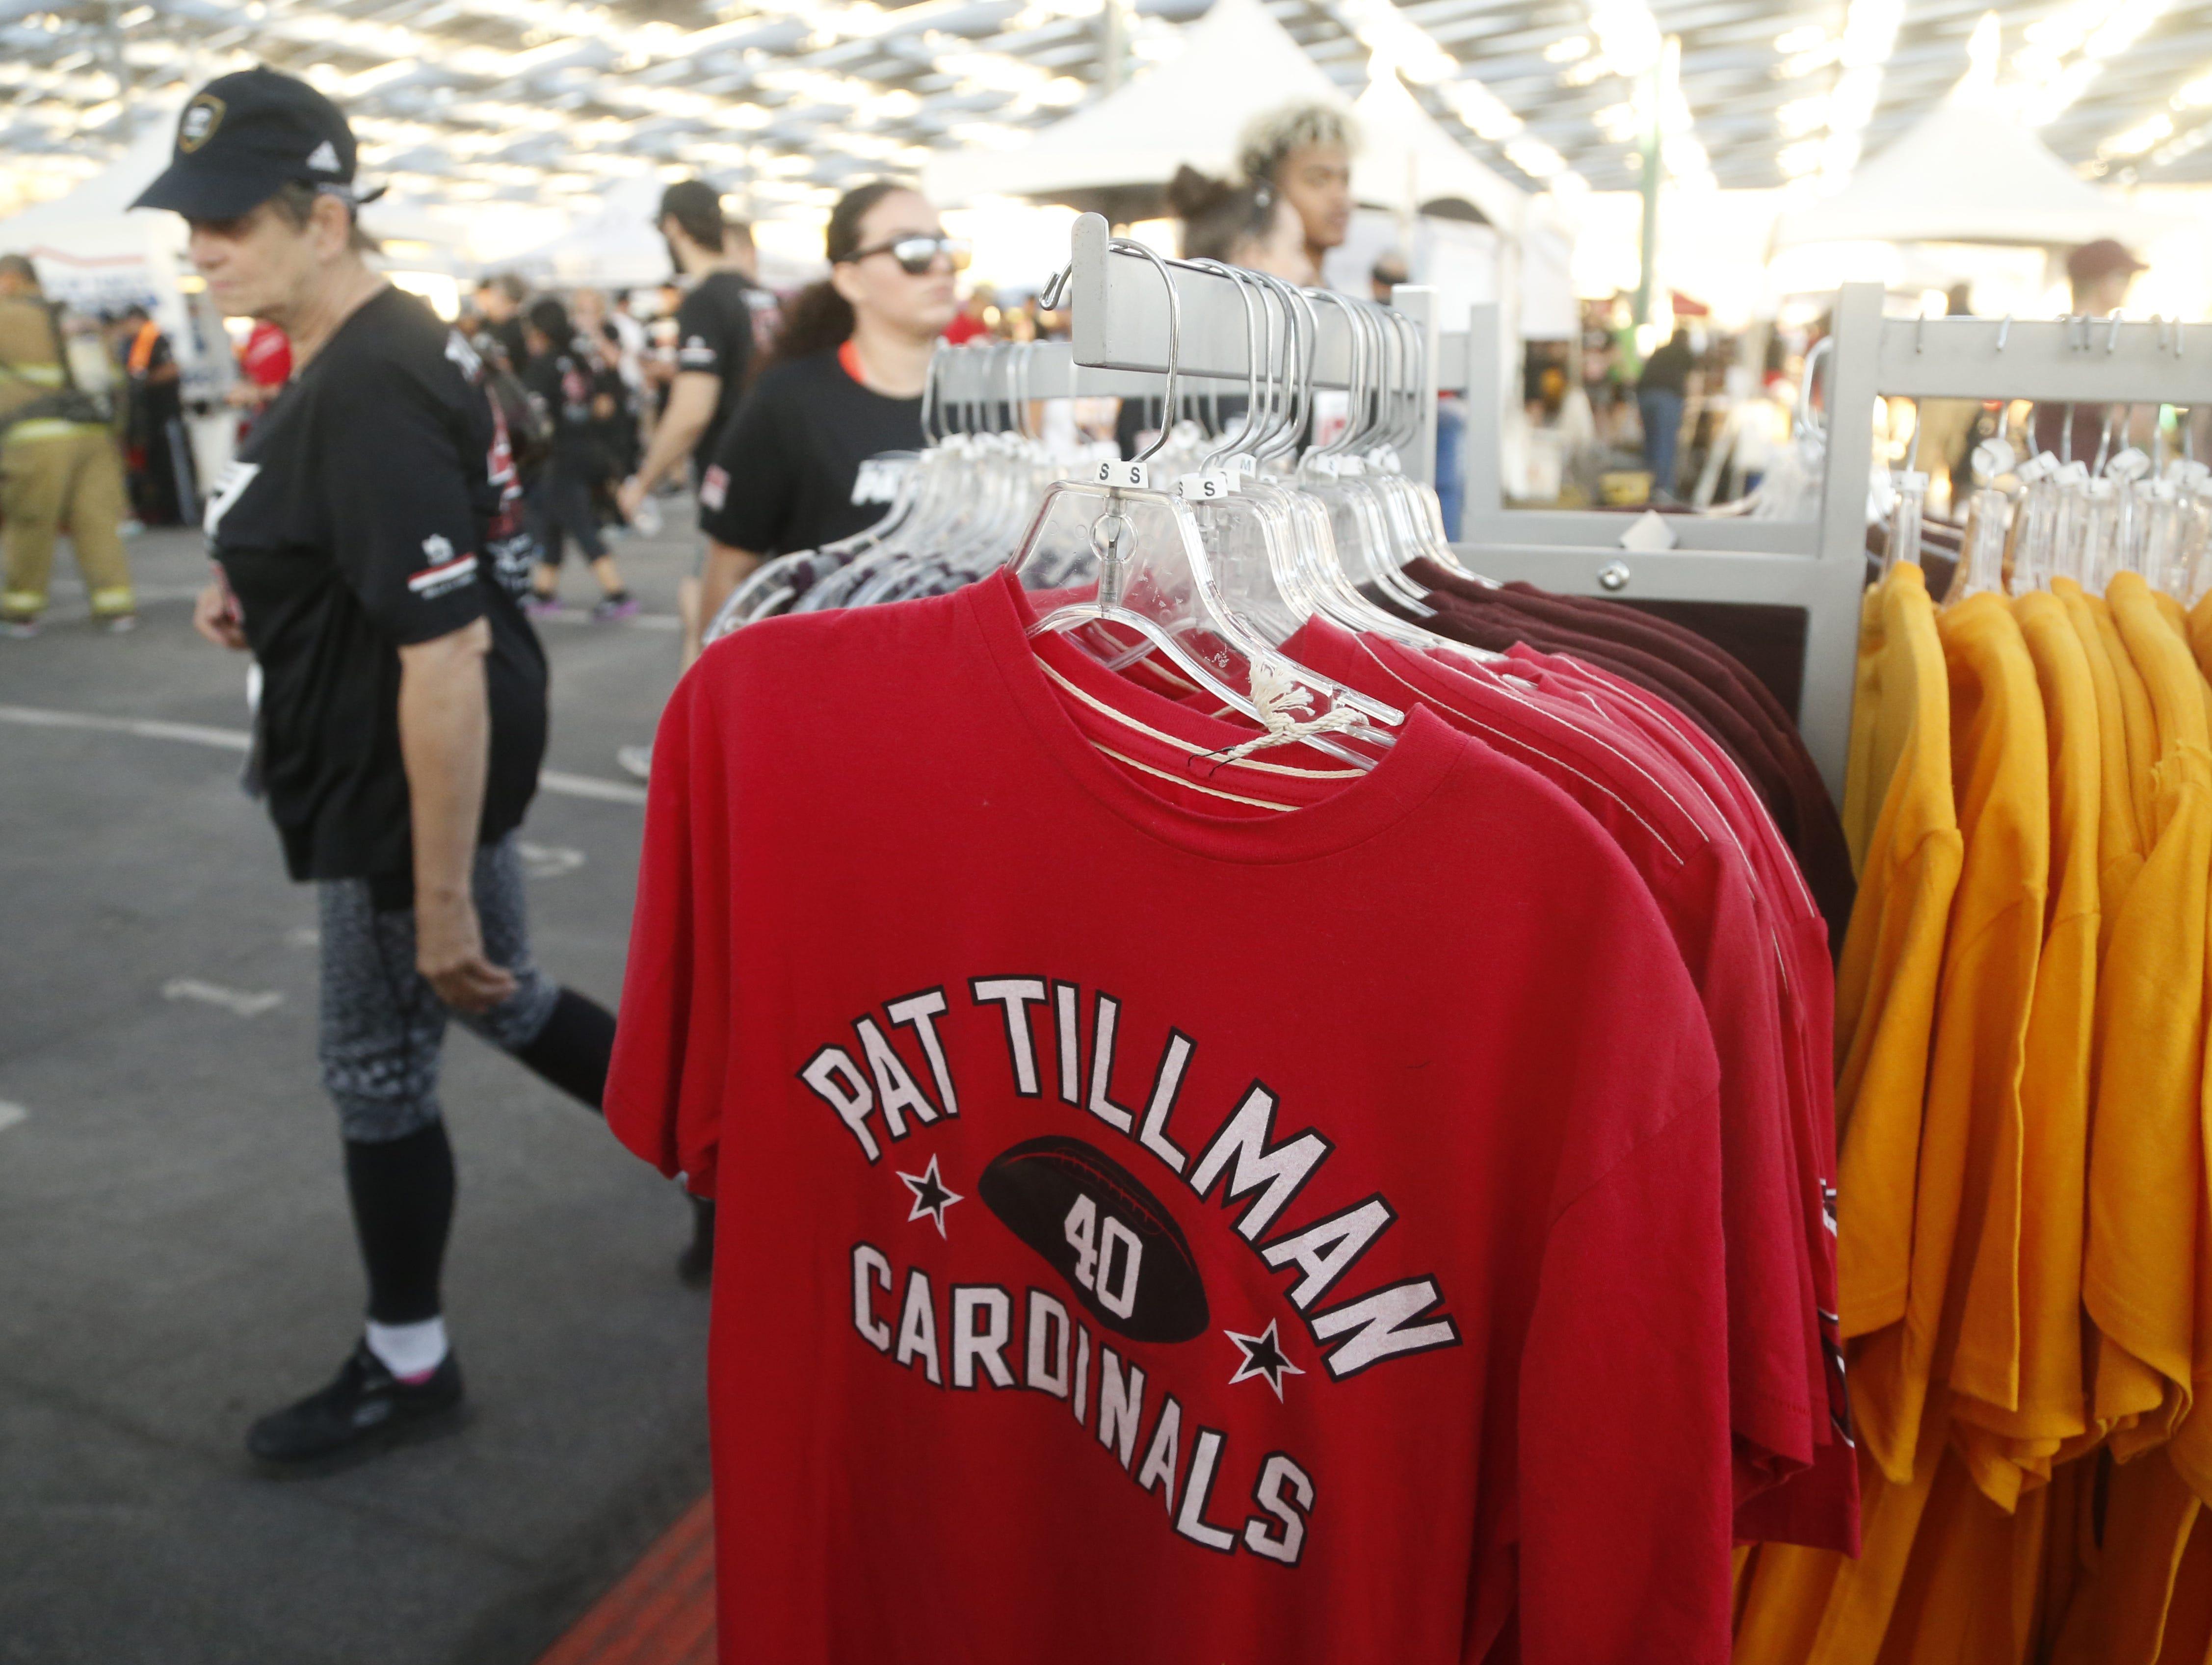 Runners buy Pat Tillman gear during Pat's Run 2019 in Tempe, Ariz. on April 27, 2019.